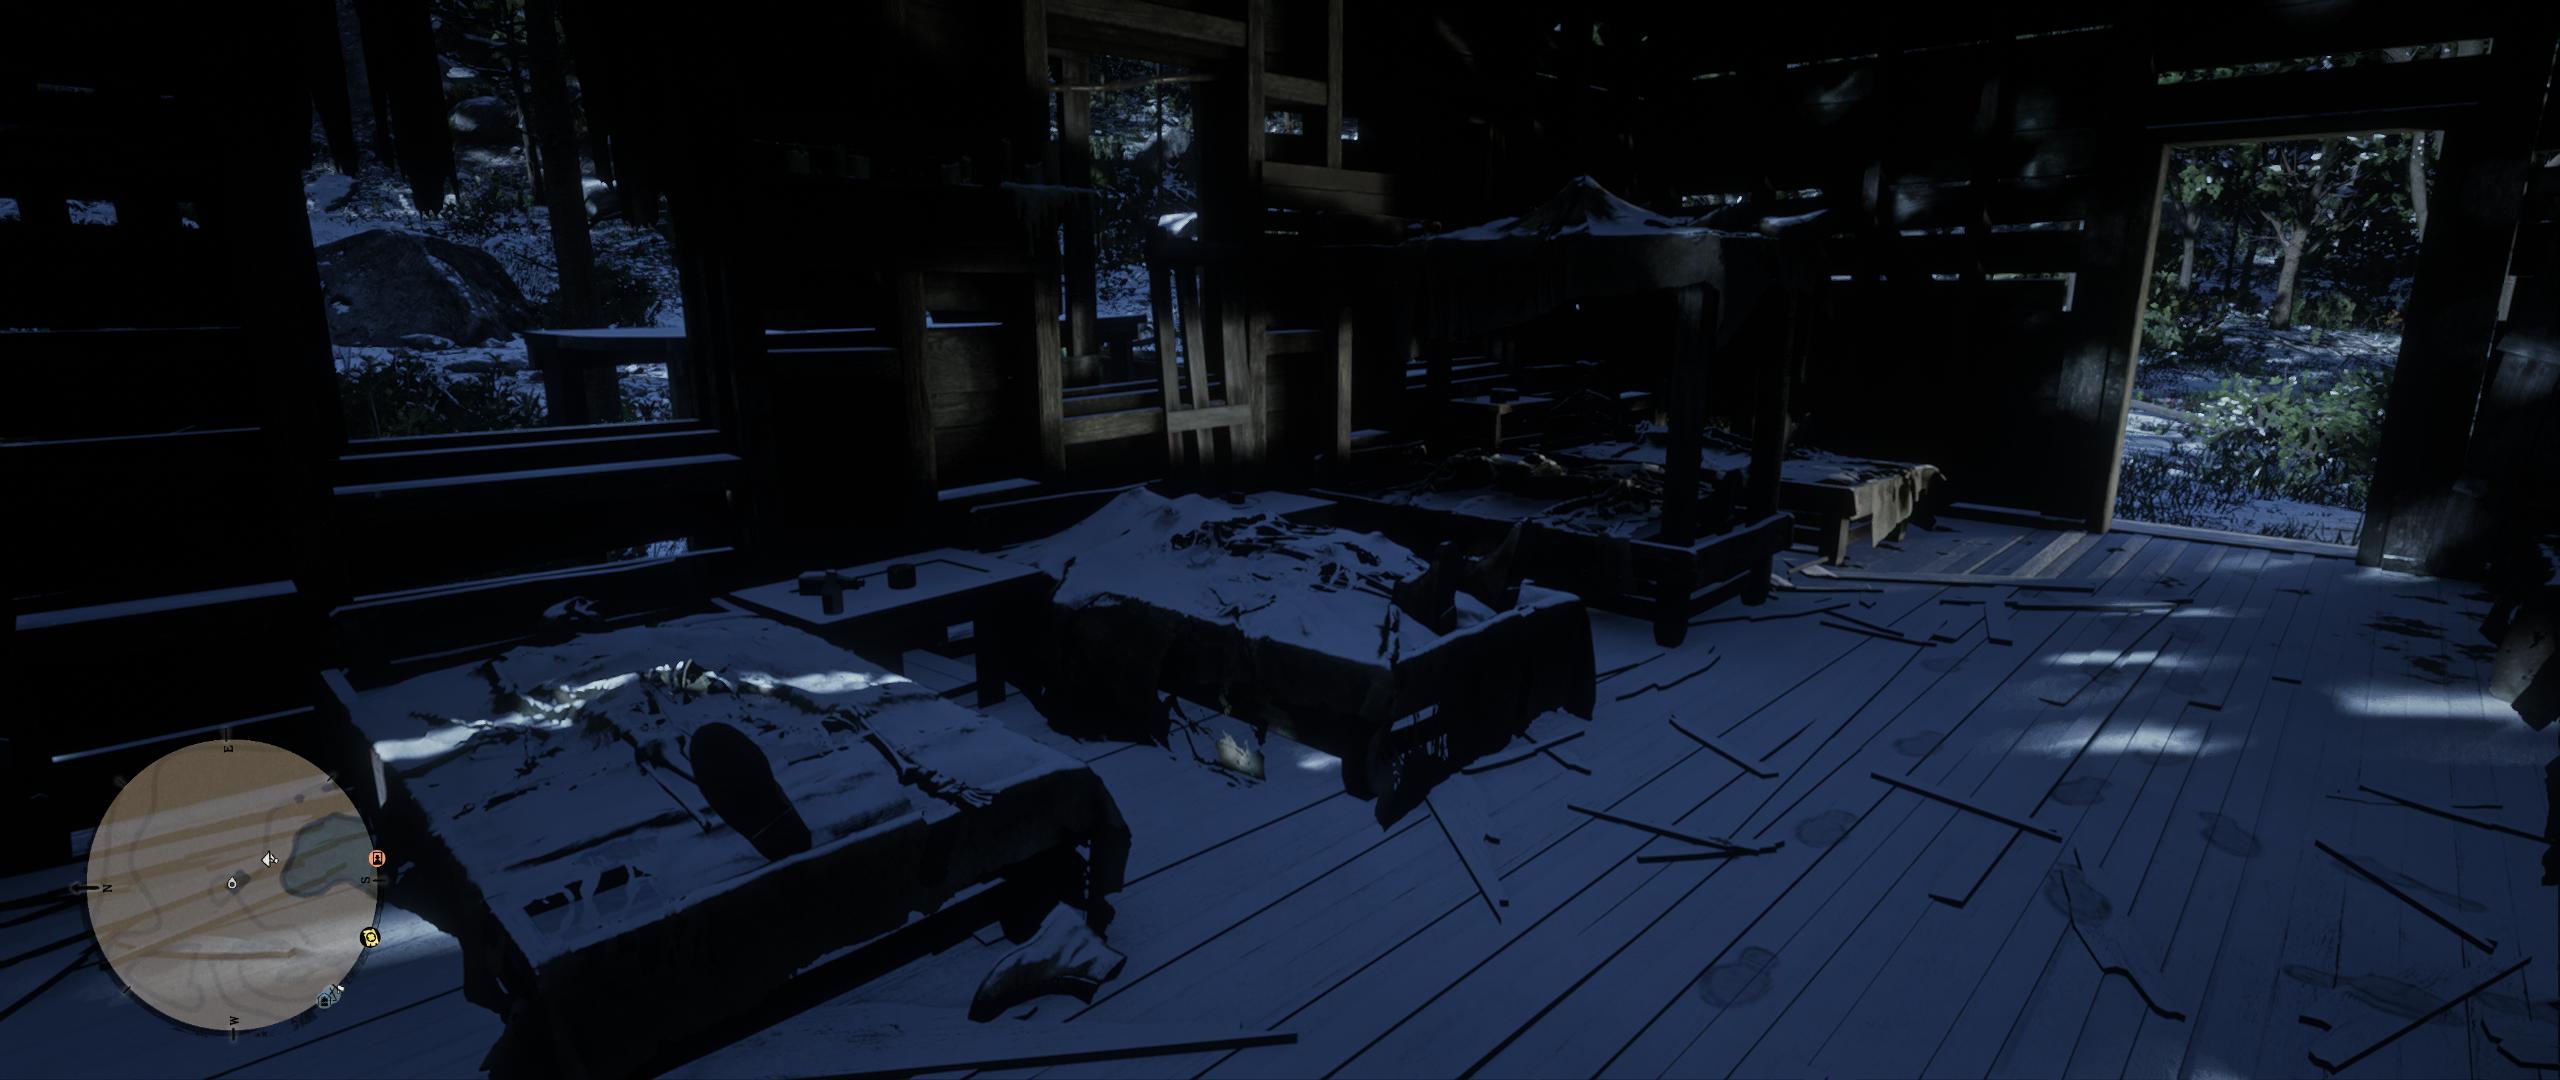 Red Dead Redemption 2 Screenshot 2019.12.22 - 15.27.16.22